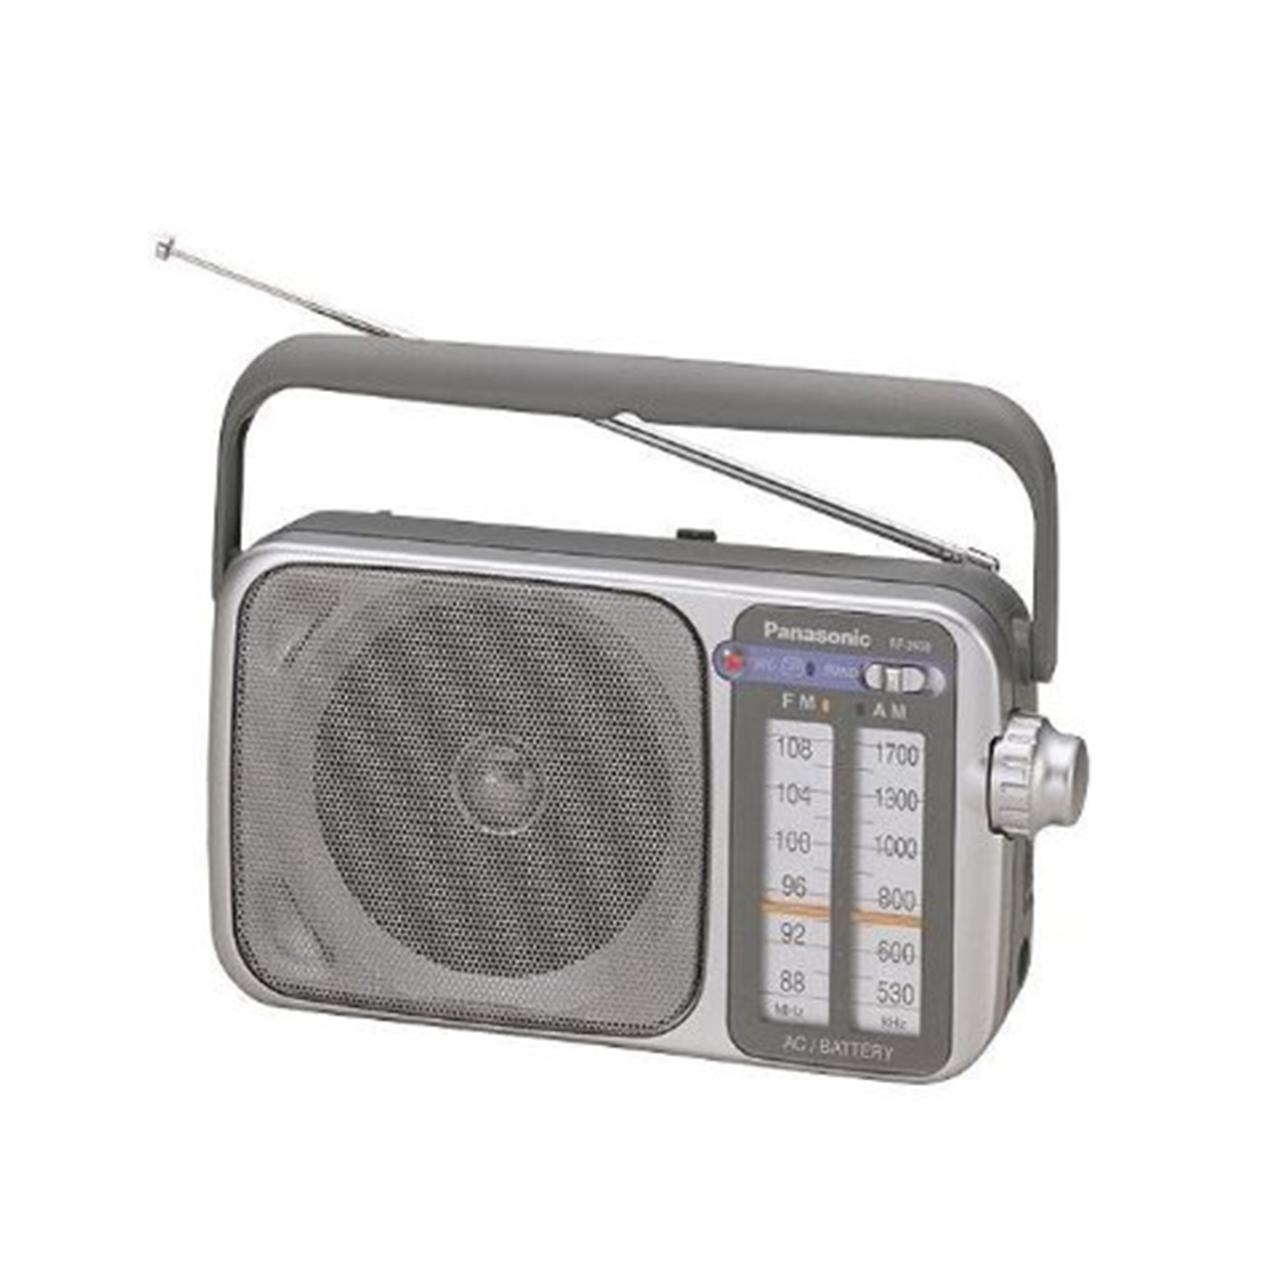 Kitchen Stereo Under Cabinet Radios Dab Internet Cd Clock Radios Soundstore